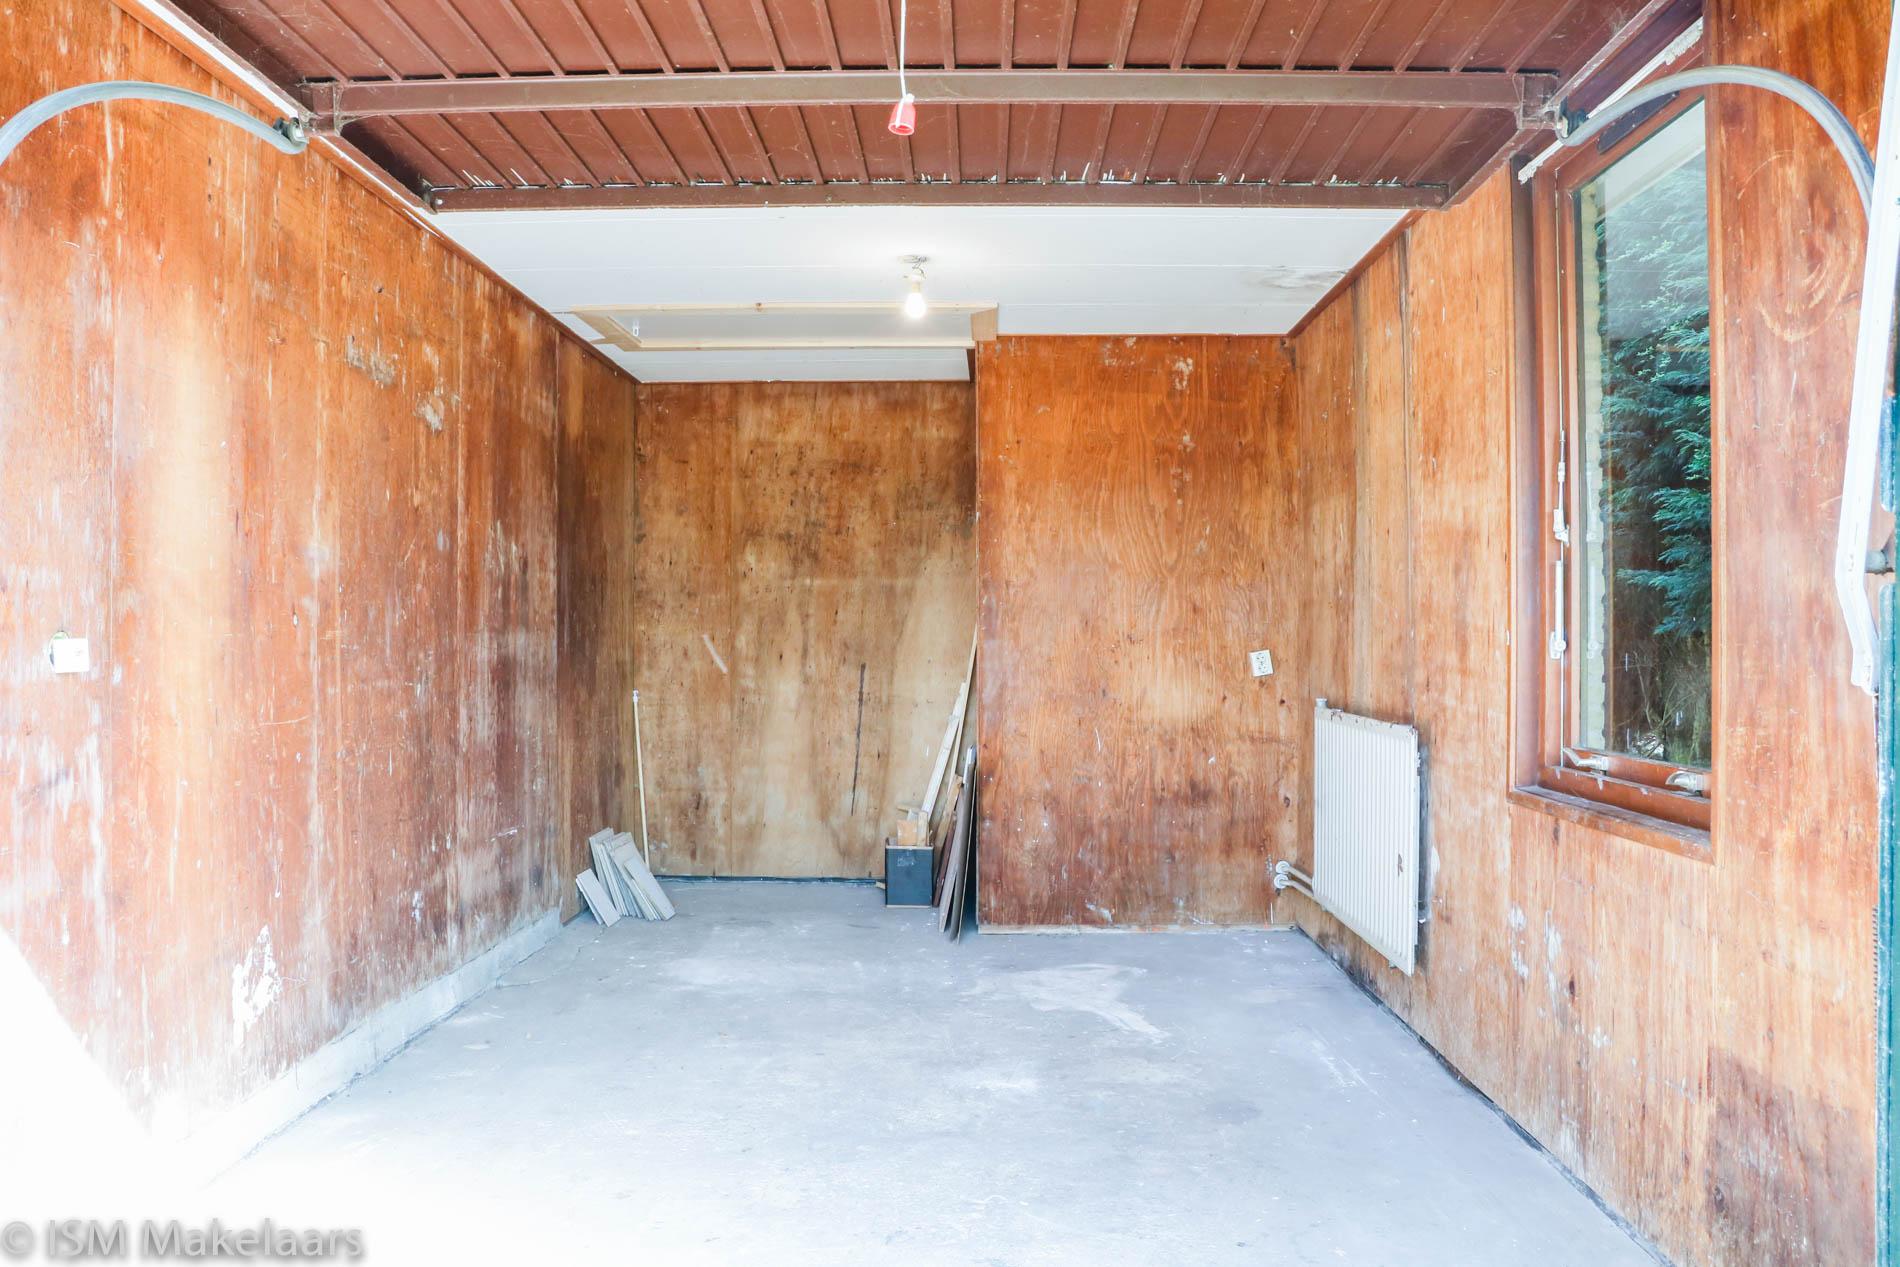 garage frambozenlaan 4 kortgene ISM Makelaars